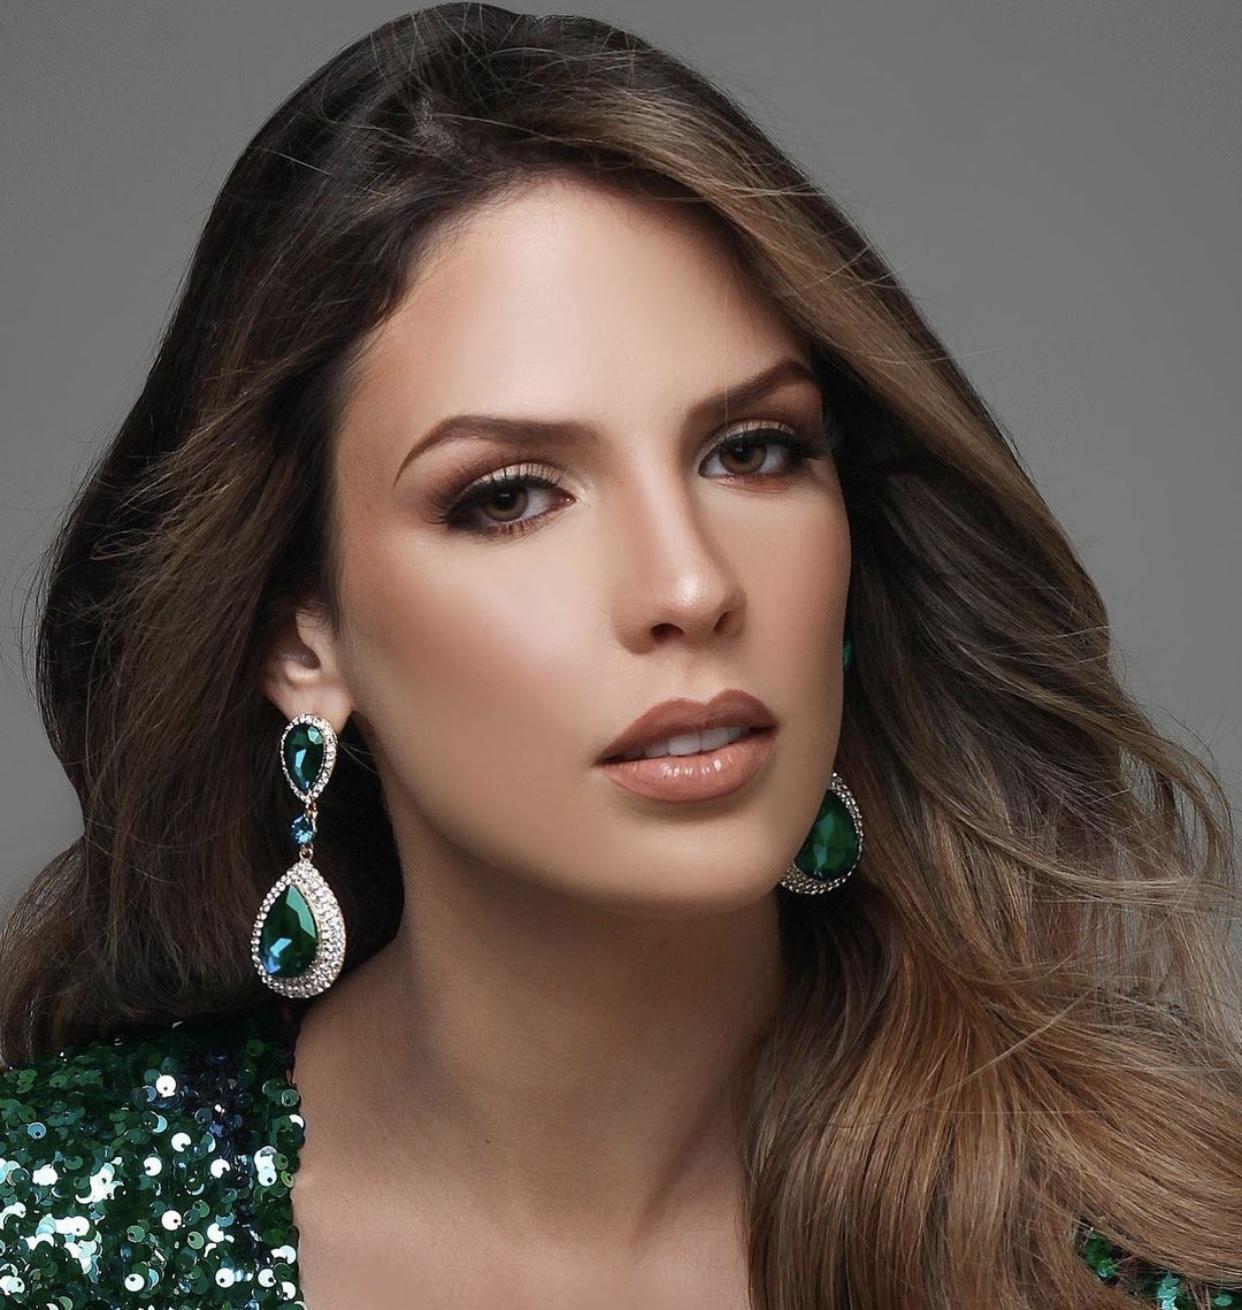 candidatas a miss venezuela 2021. final: 28 oct. - Página 4 B252-E8-D5-6149-428-B-BE95-F66-B8-BAE4678